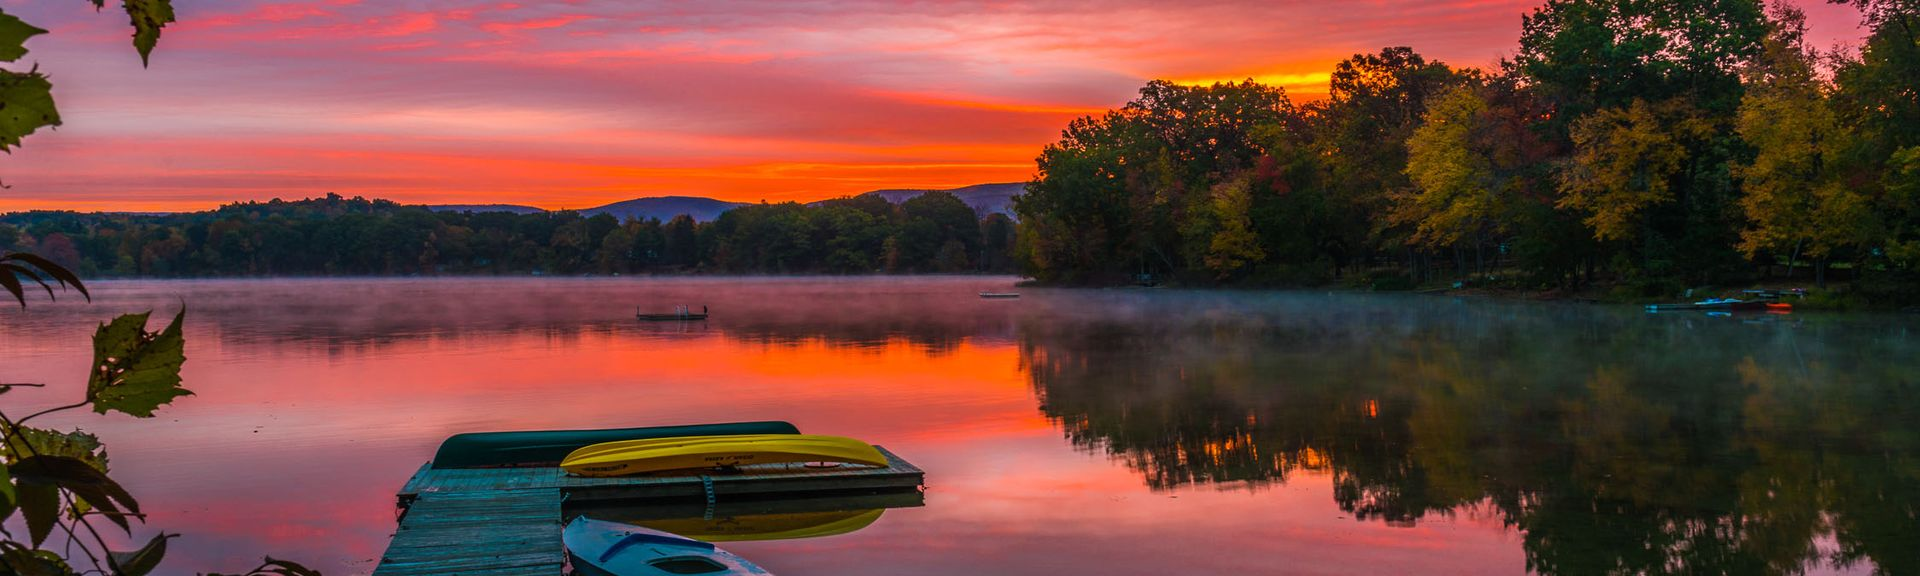 Copake Lake, Copake, Craryville, New York, United States of America